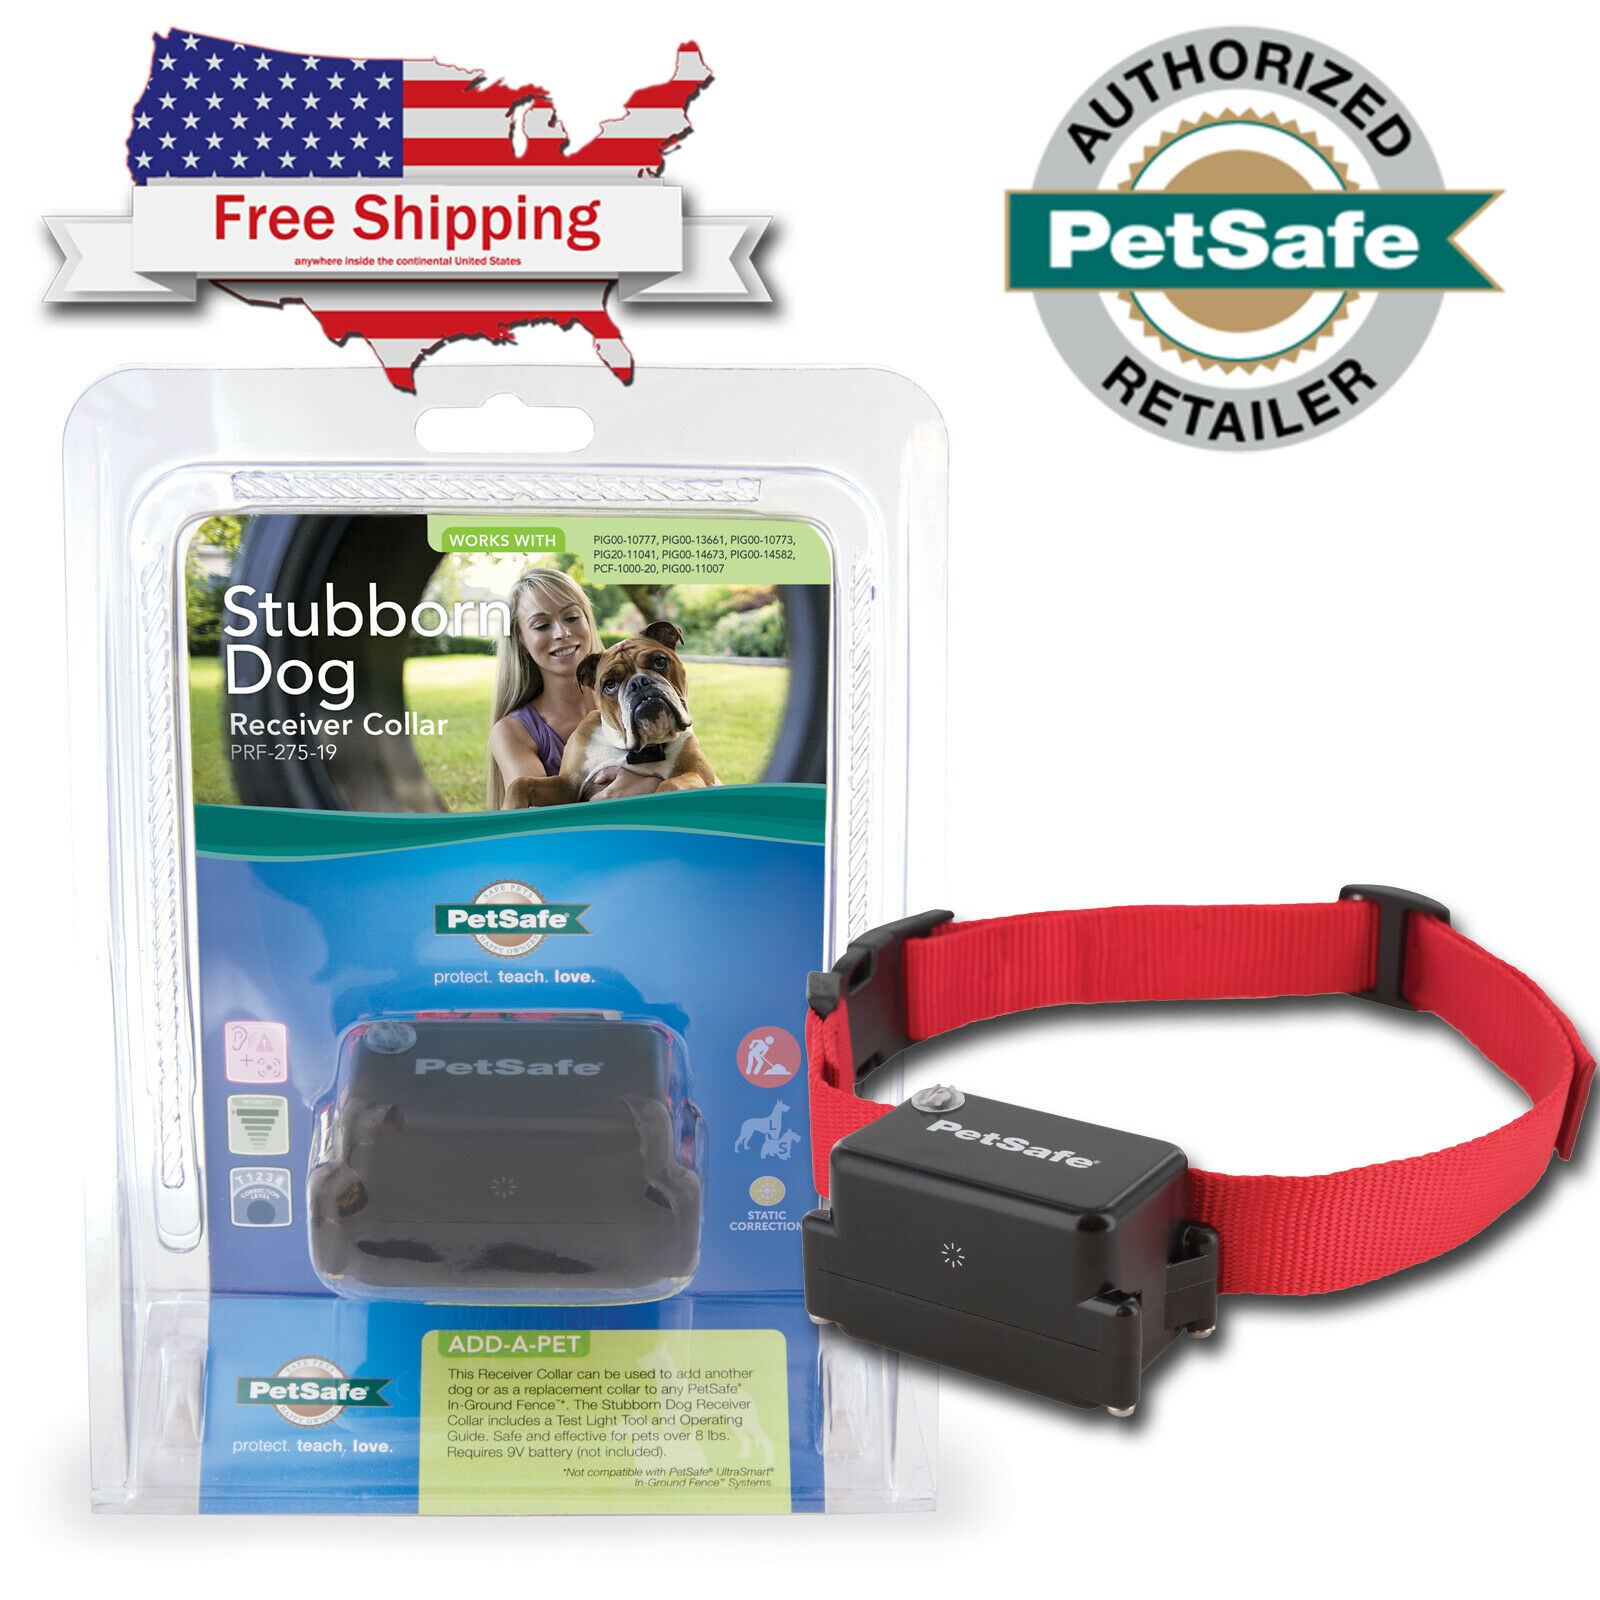 petsafe-stubborn-dog-collar-receiver-for-inground-fence-prf-275-19